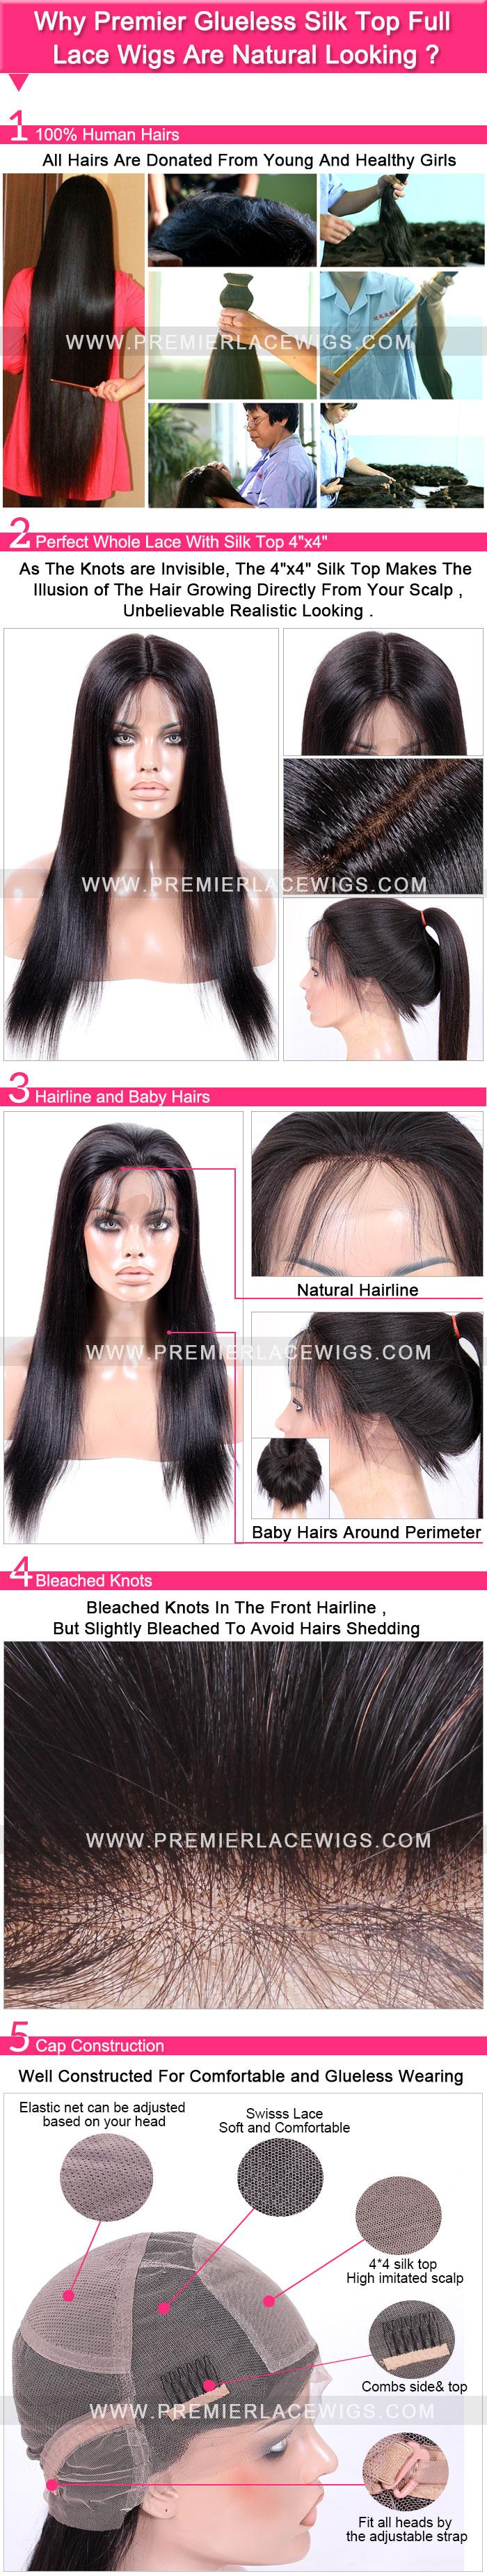 glueless silk top full lace wig